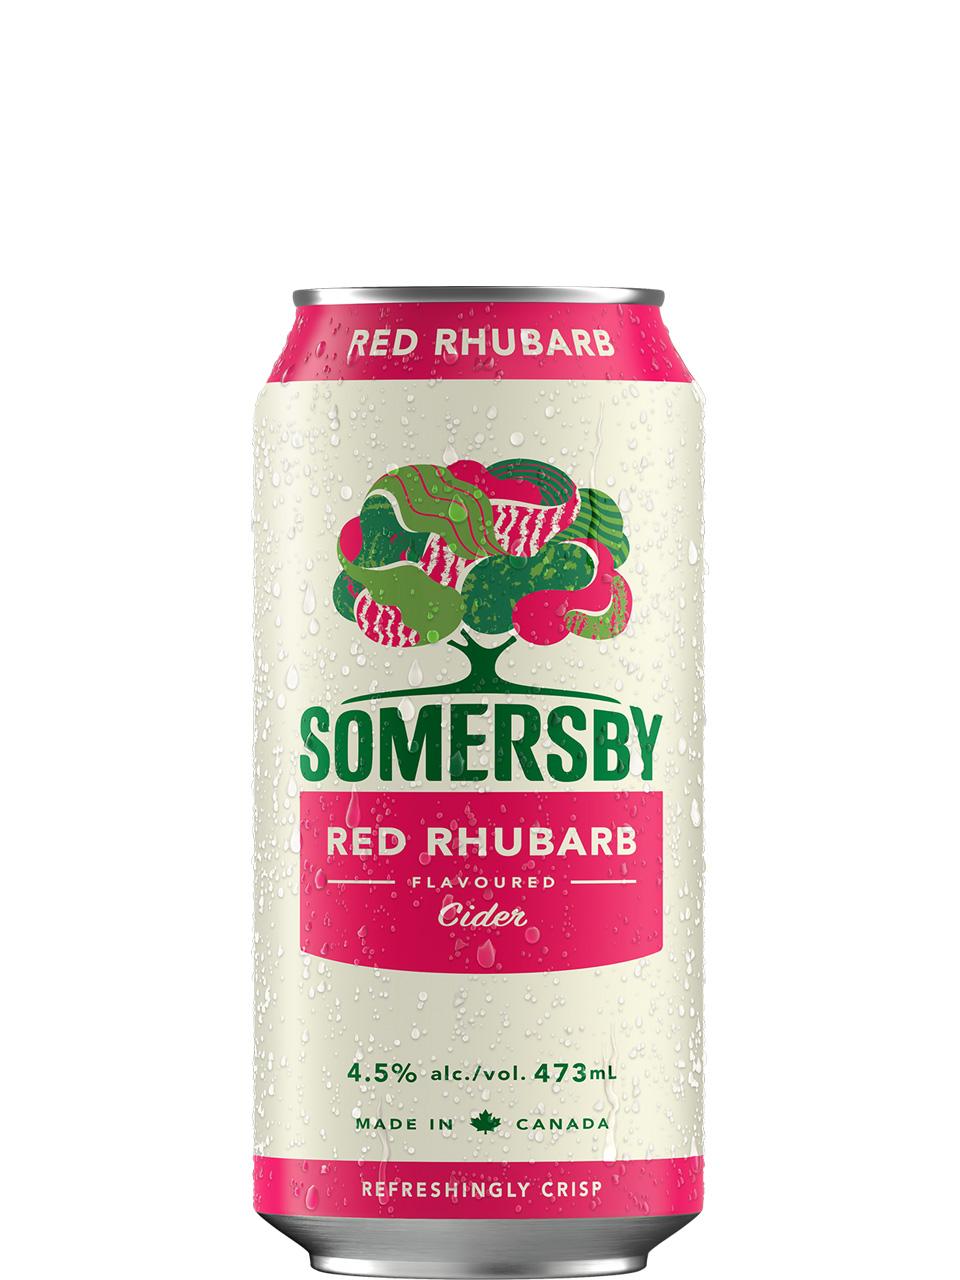 Somersby Red Rhubarb Cider 473ml